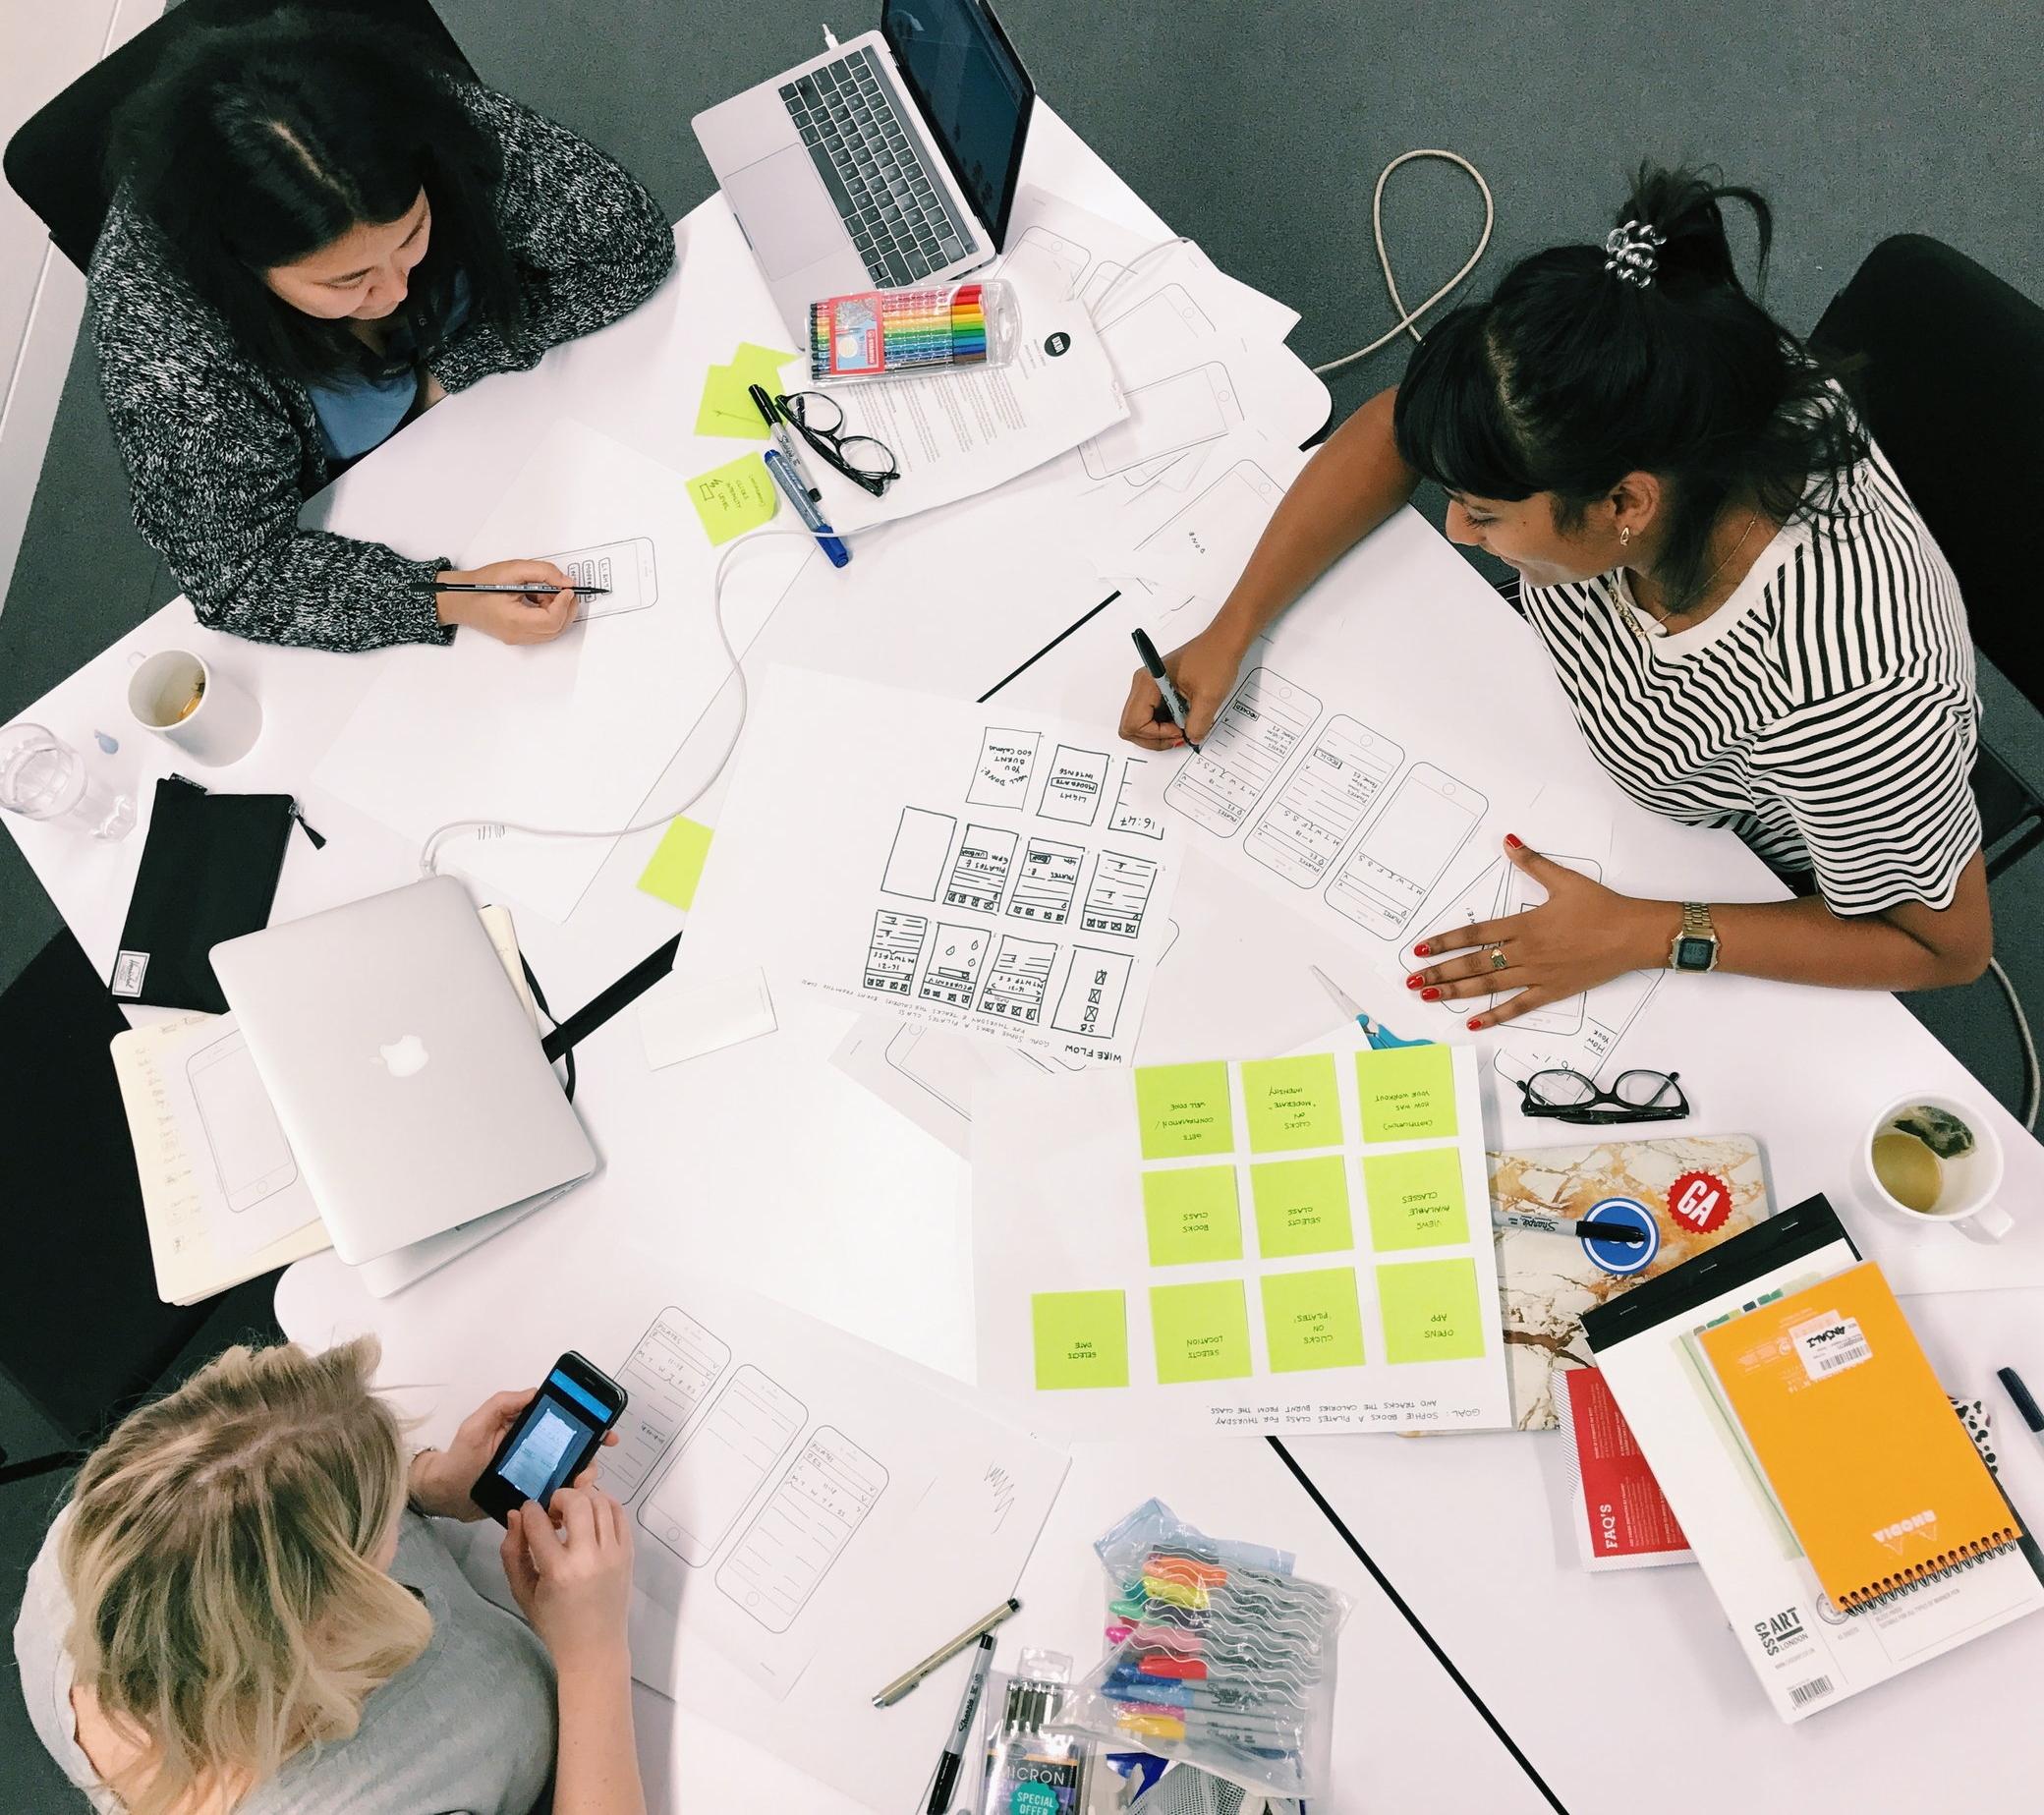 Design Studio. Team (L - R: Claire Donohue, Victoria Klotz and Anjali D'Souza)